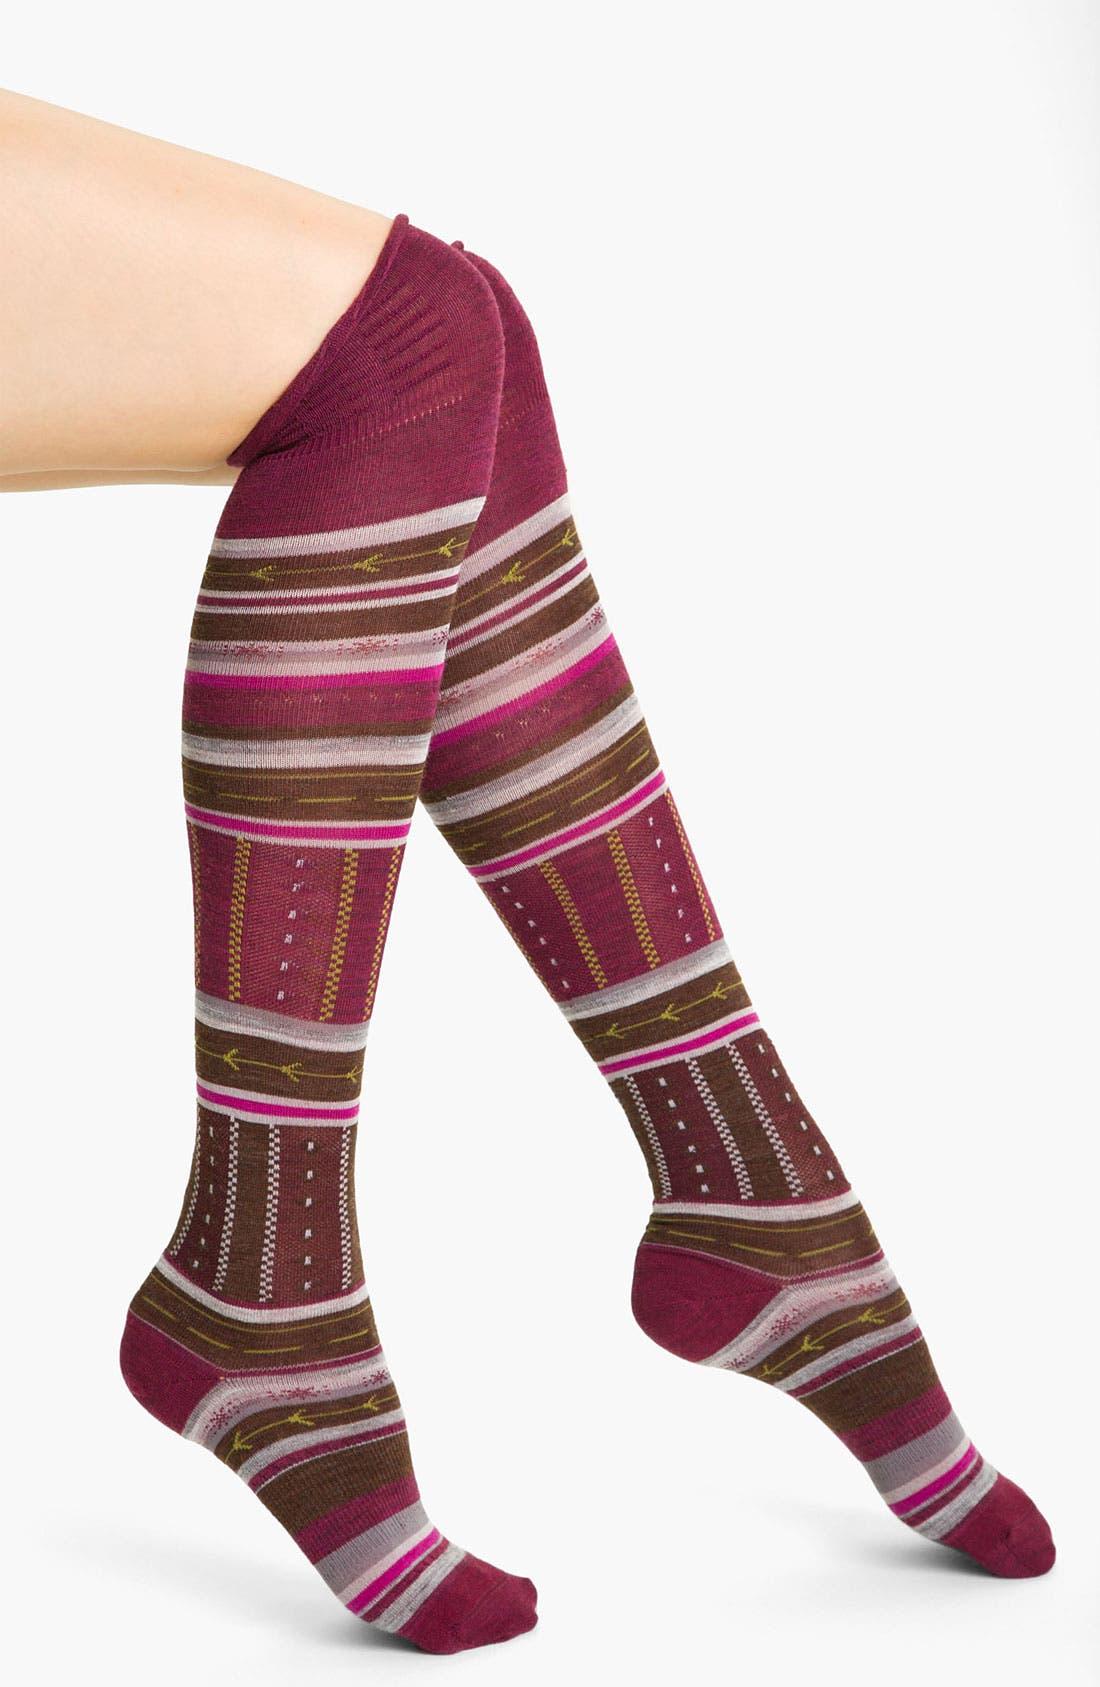 Main Image - Smartwool 'Gleaming Seedling' Knee Socks